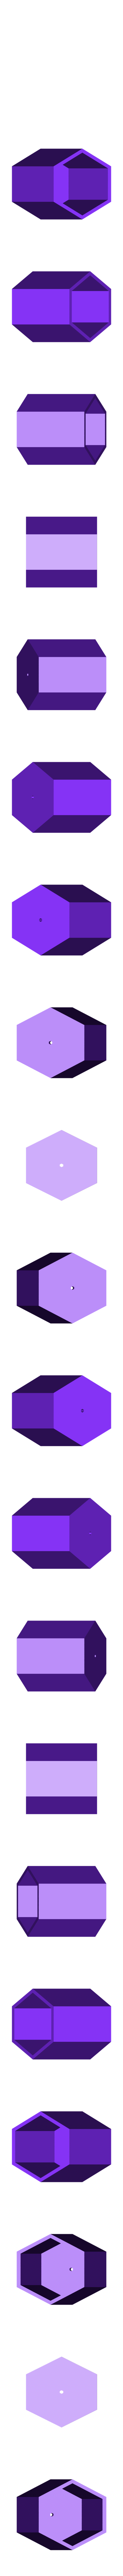 hexagonal planter.stl Download free STL file Hexagonal planter  • 3D printer model, solunkejagruti